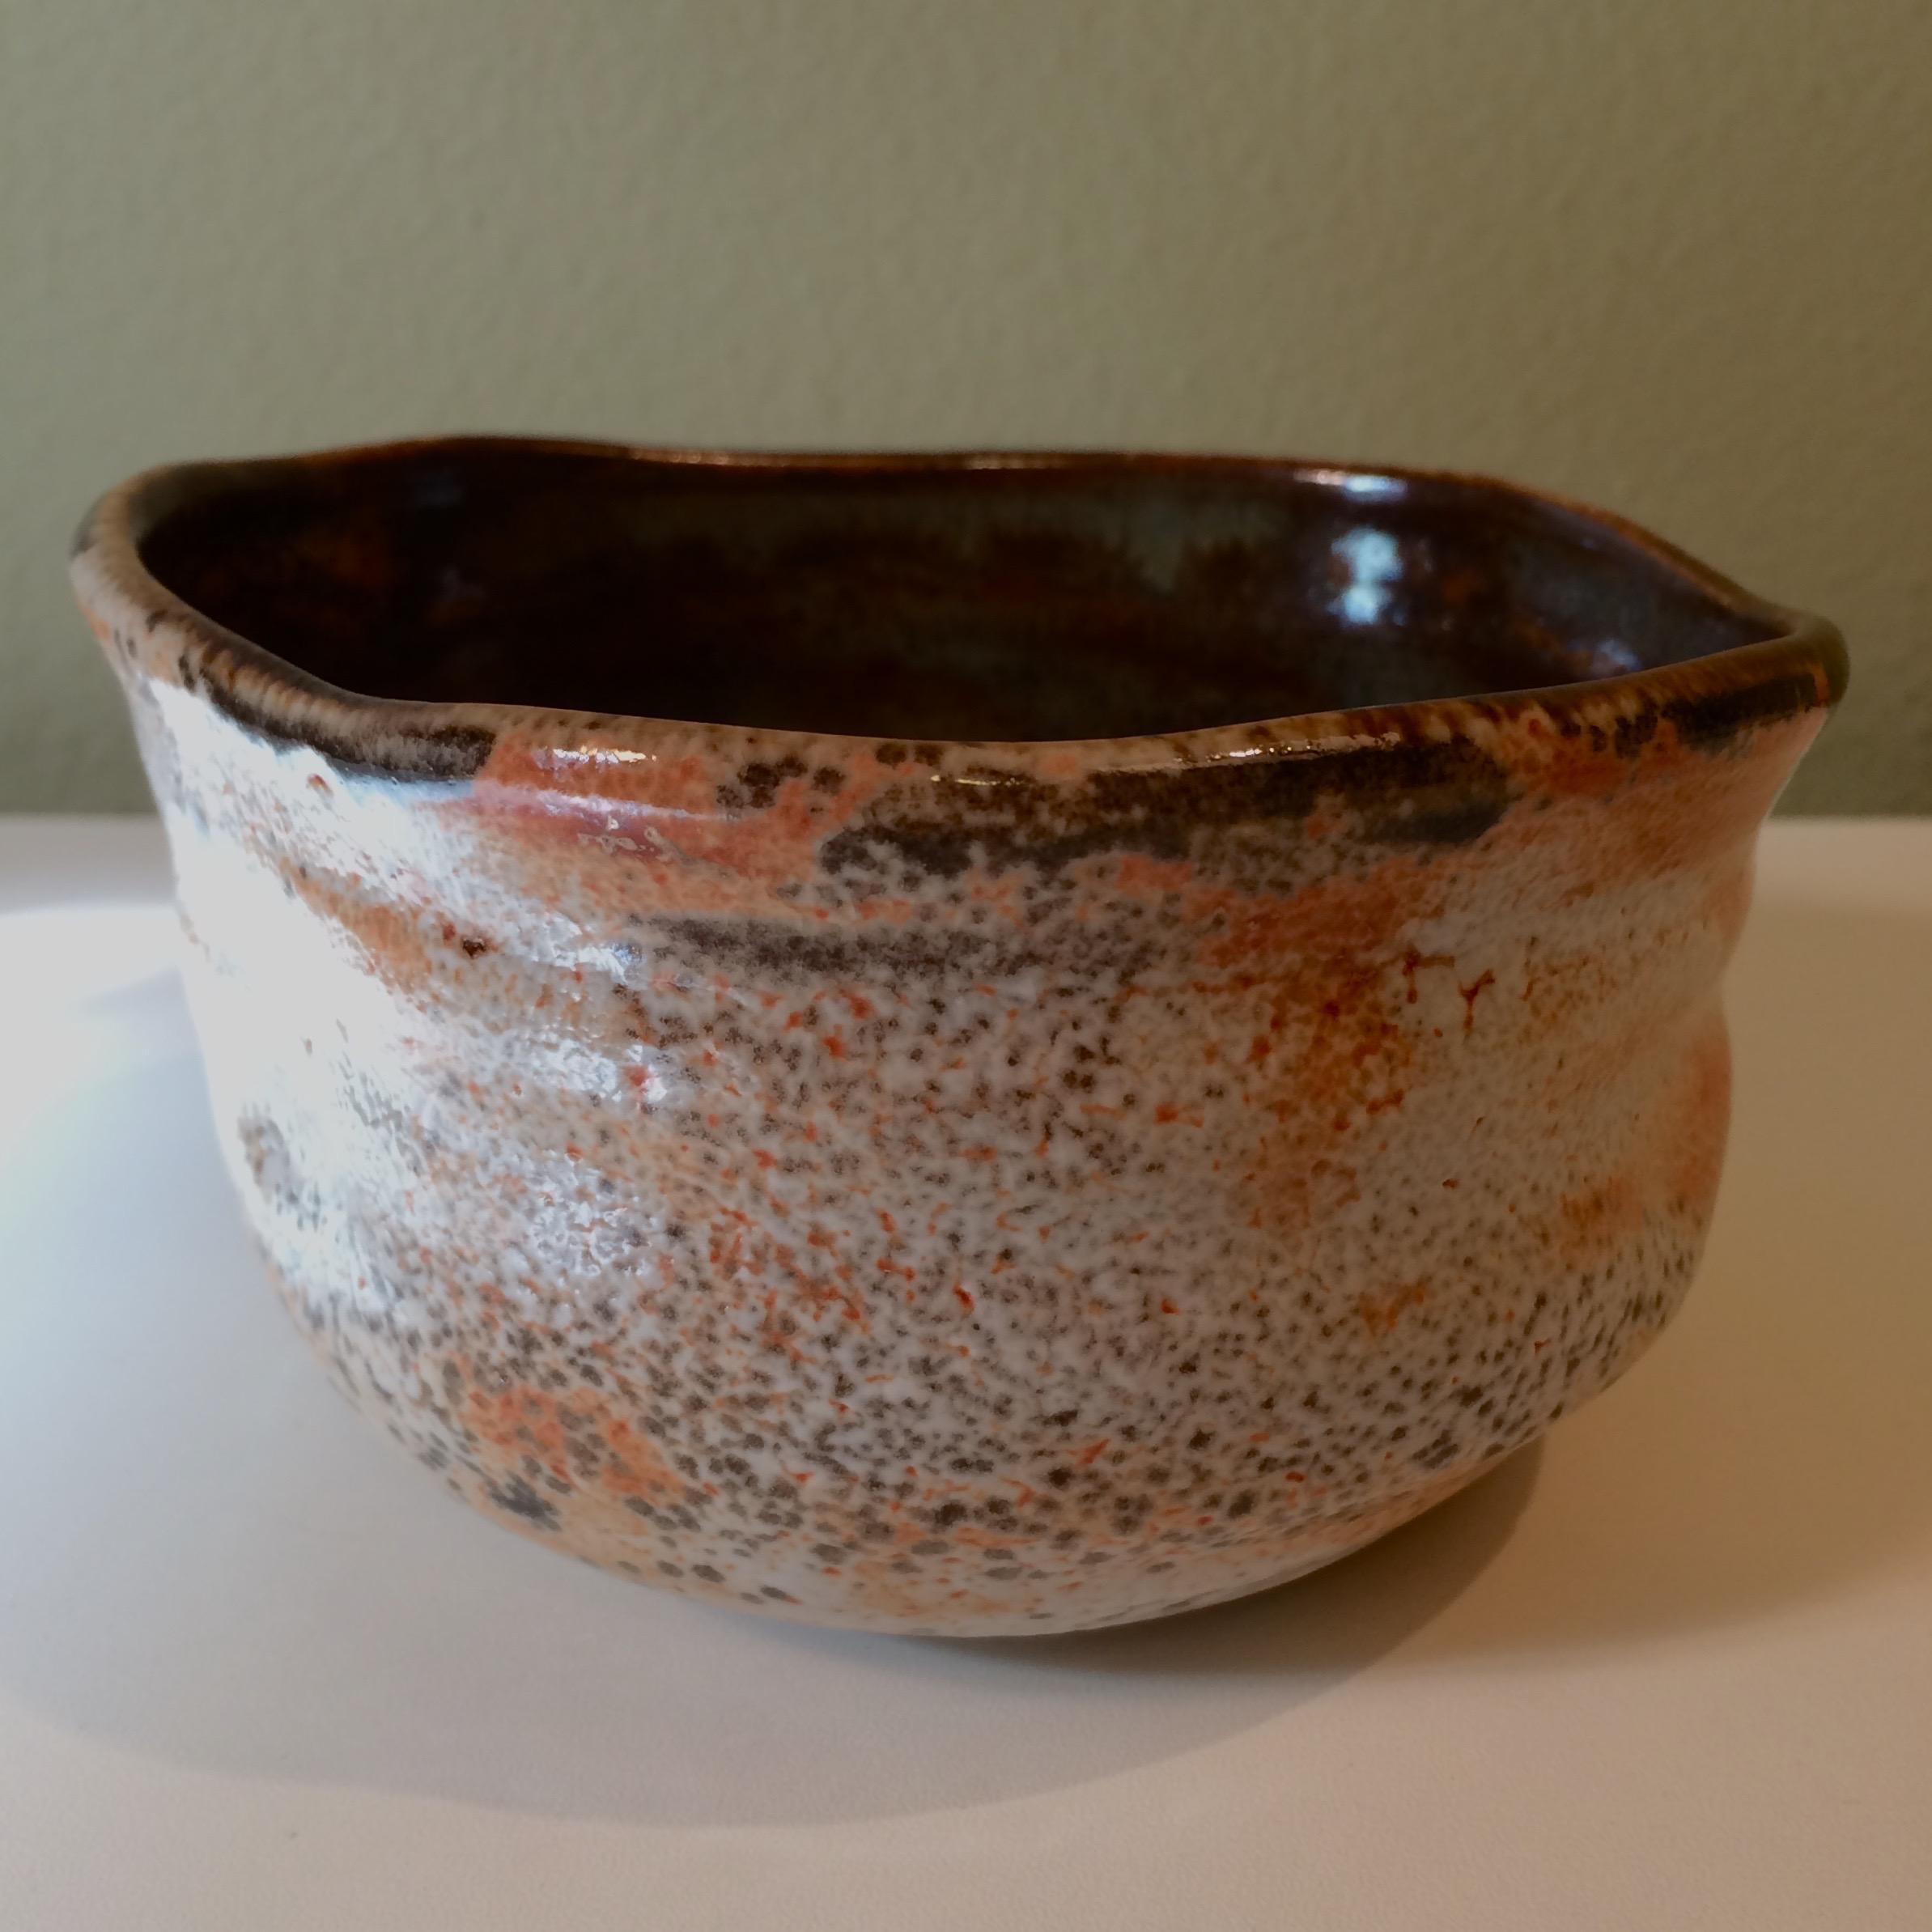 Chawan, tea bowl - American Shino glaze on high fire stoneware